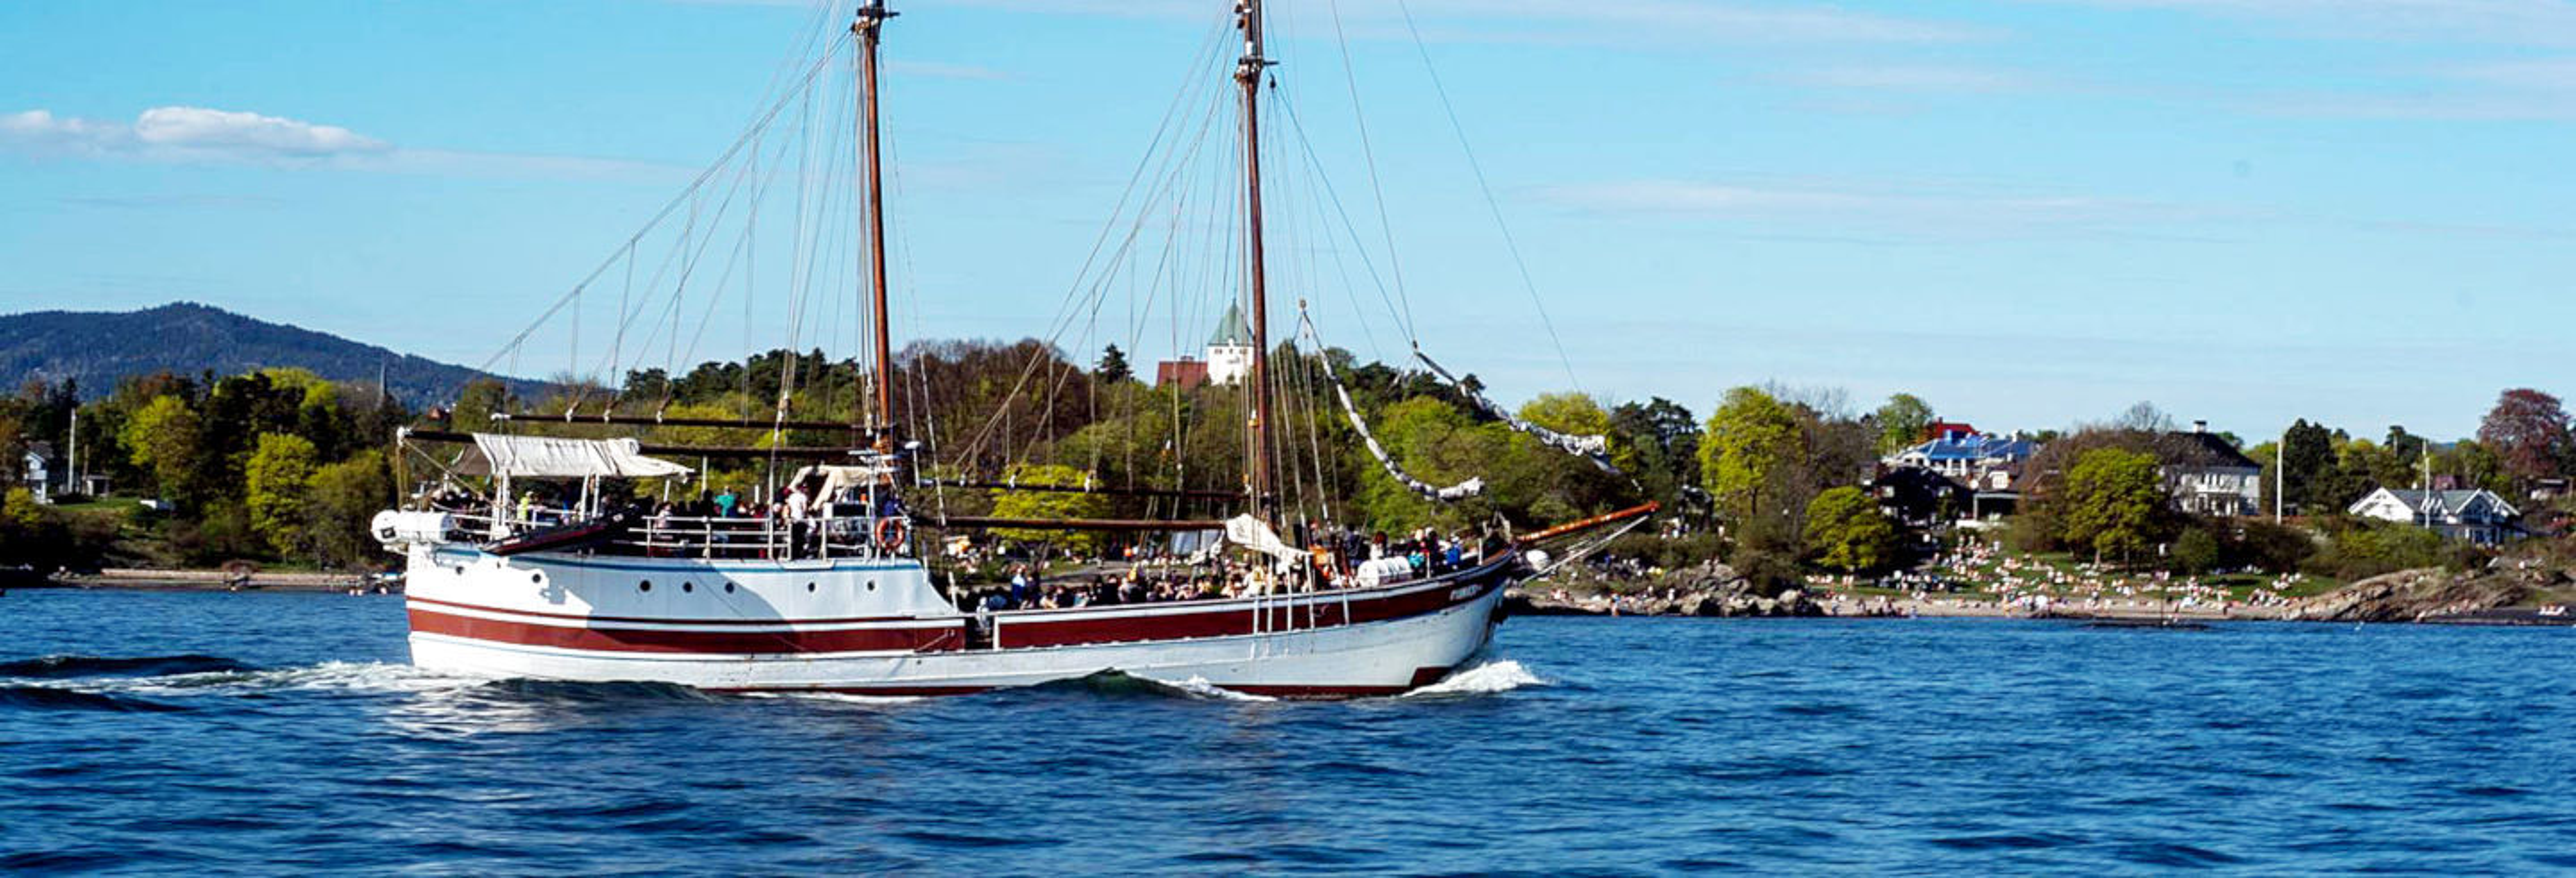 Passeio de barco pelo fiorde de Oslo